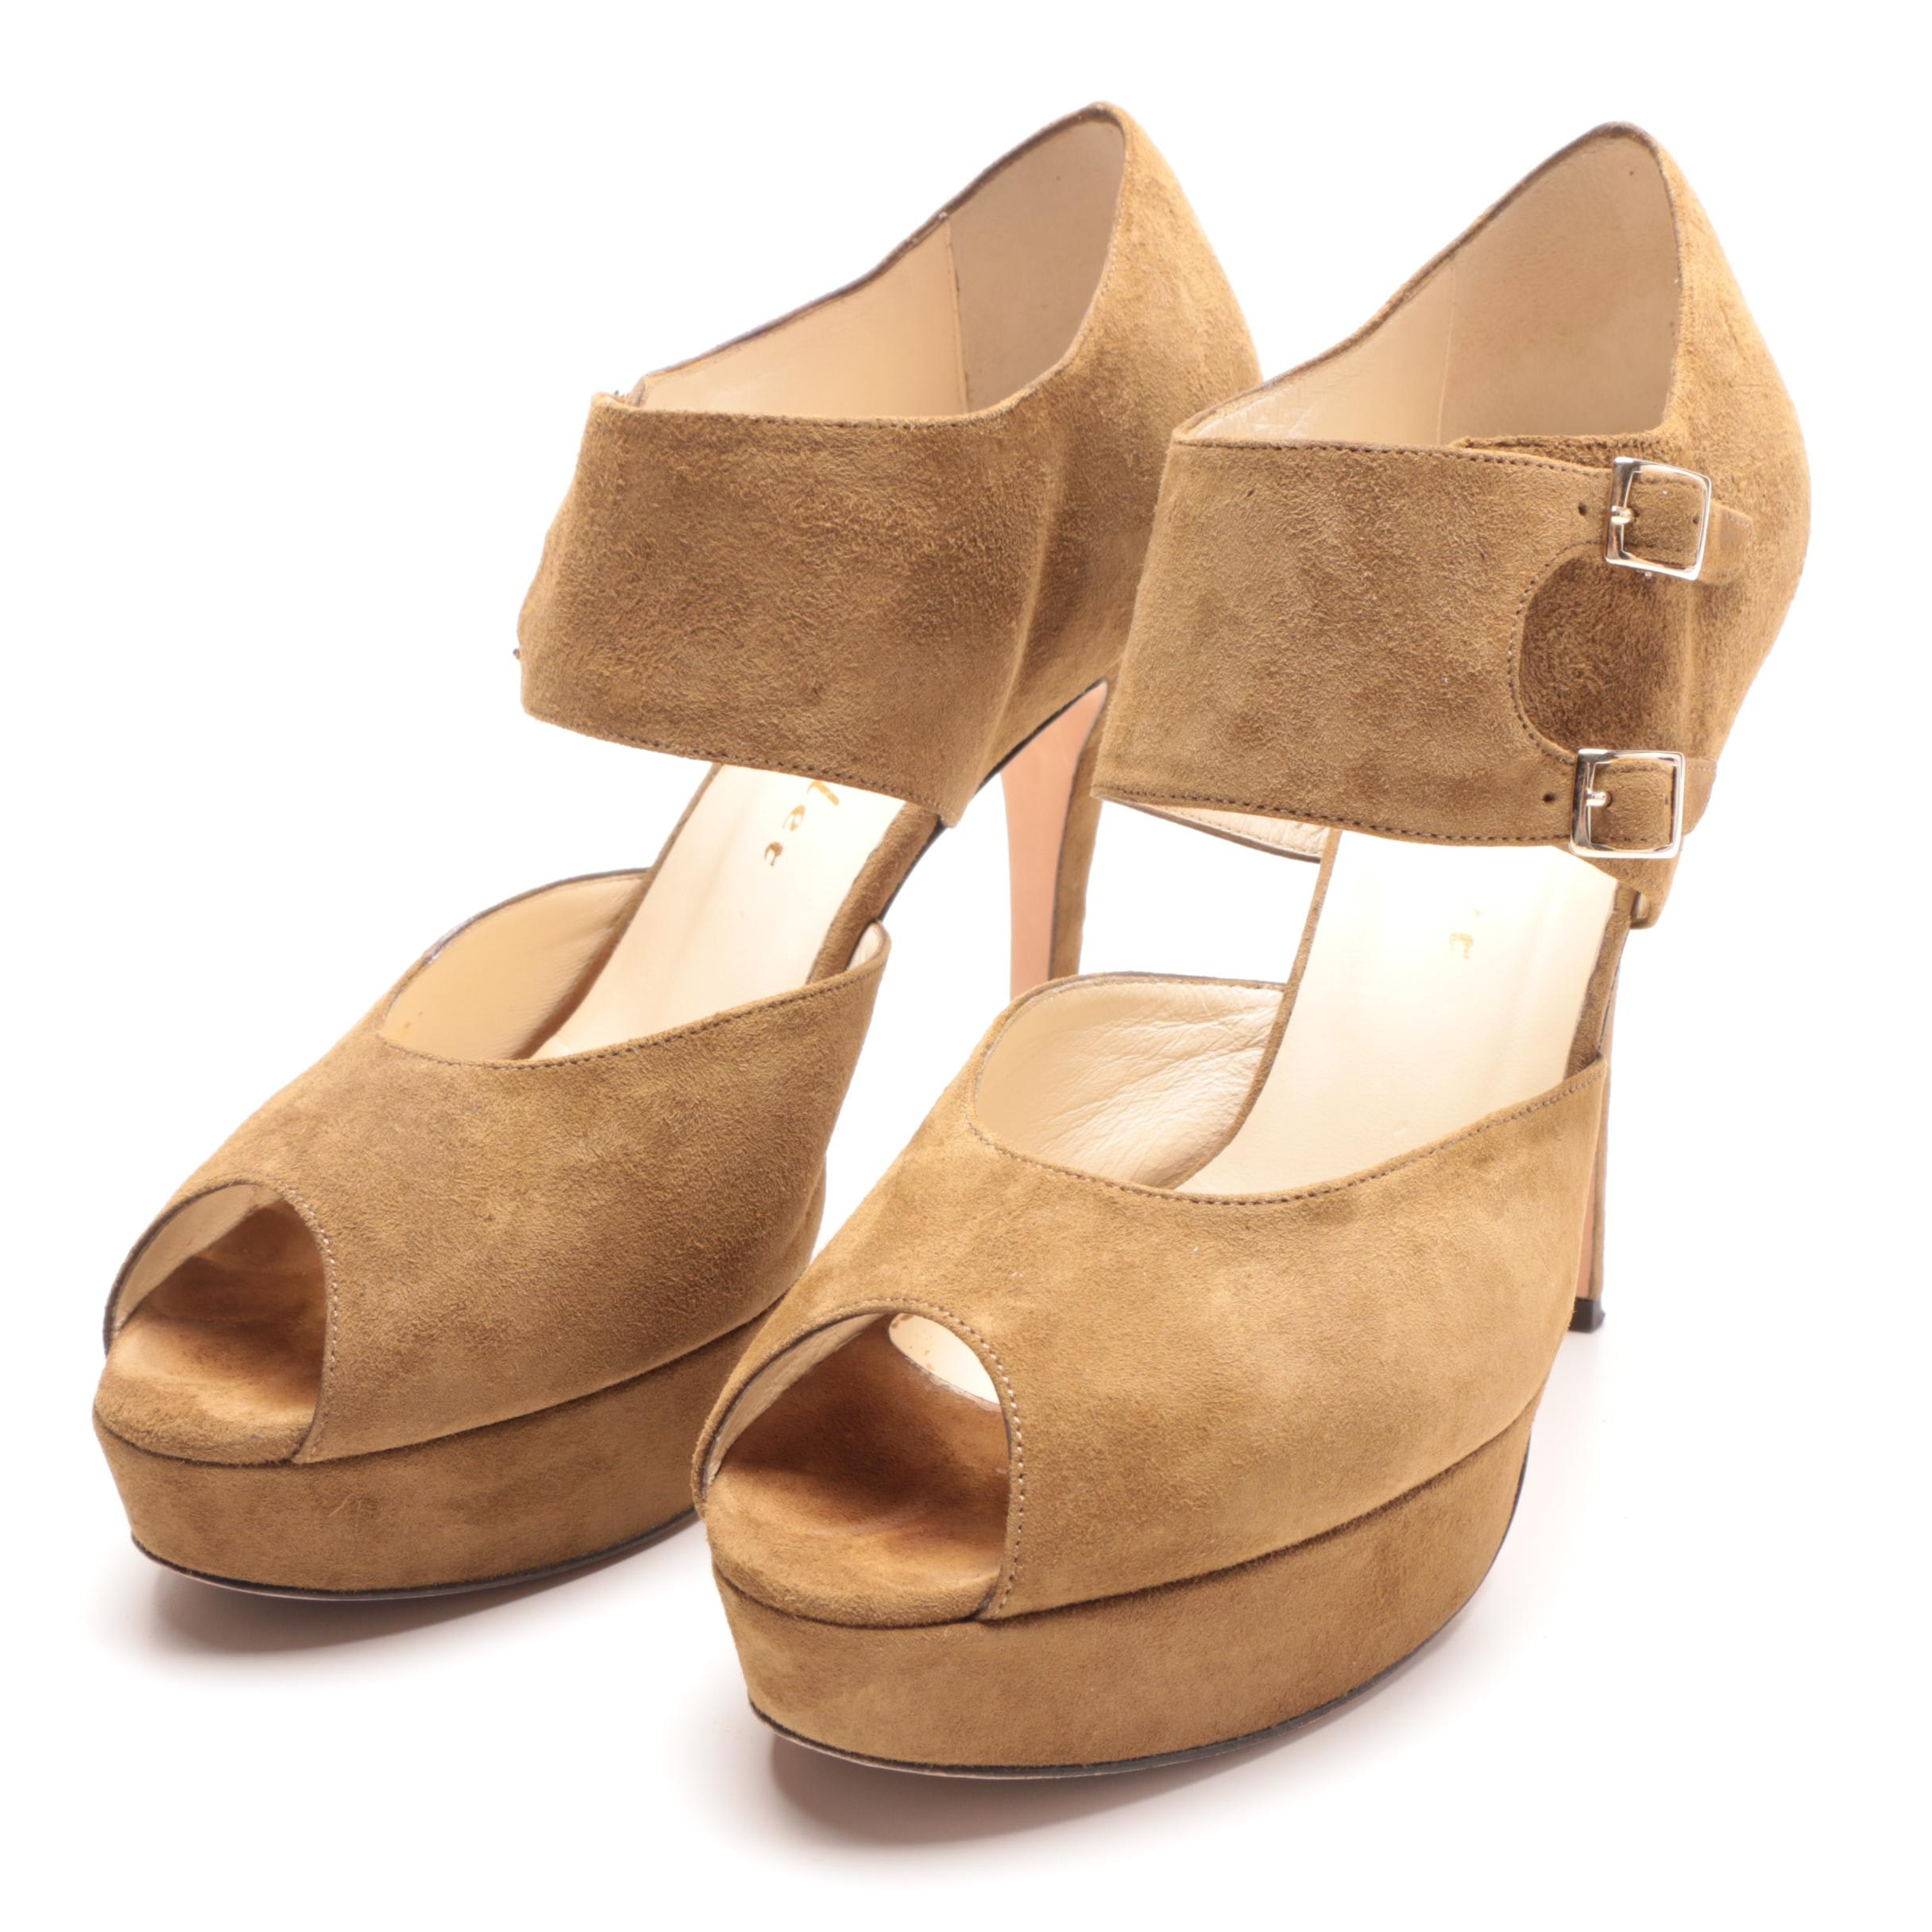 Bettye Muller Tan Suede Peep-Toe Platform Dress Sandals with Box